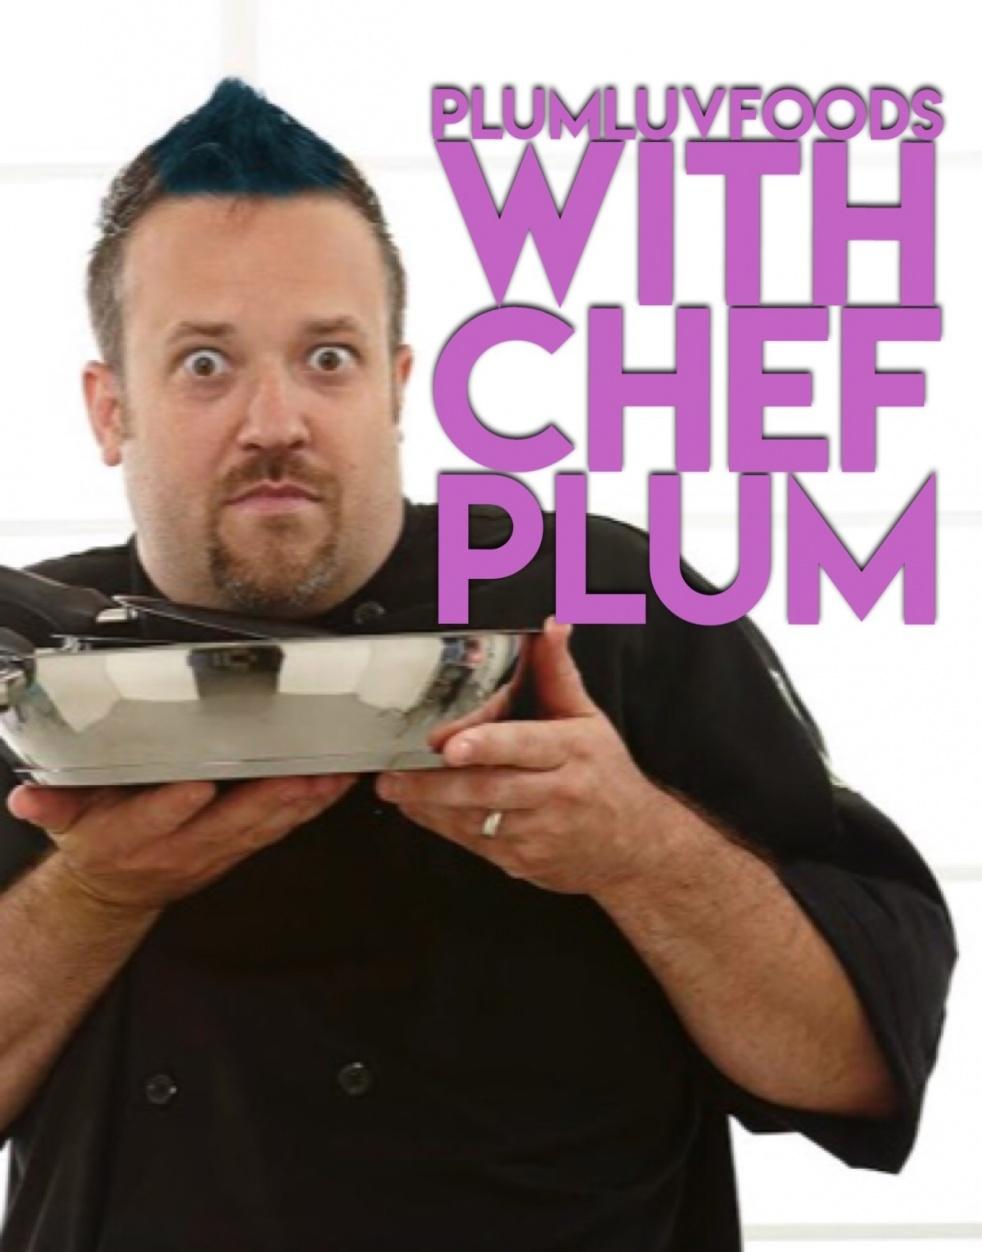 Plumluvfoods - immagine di copertina